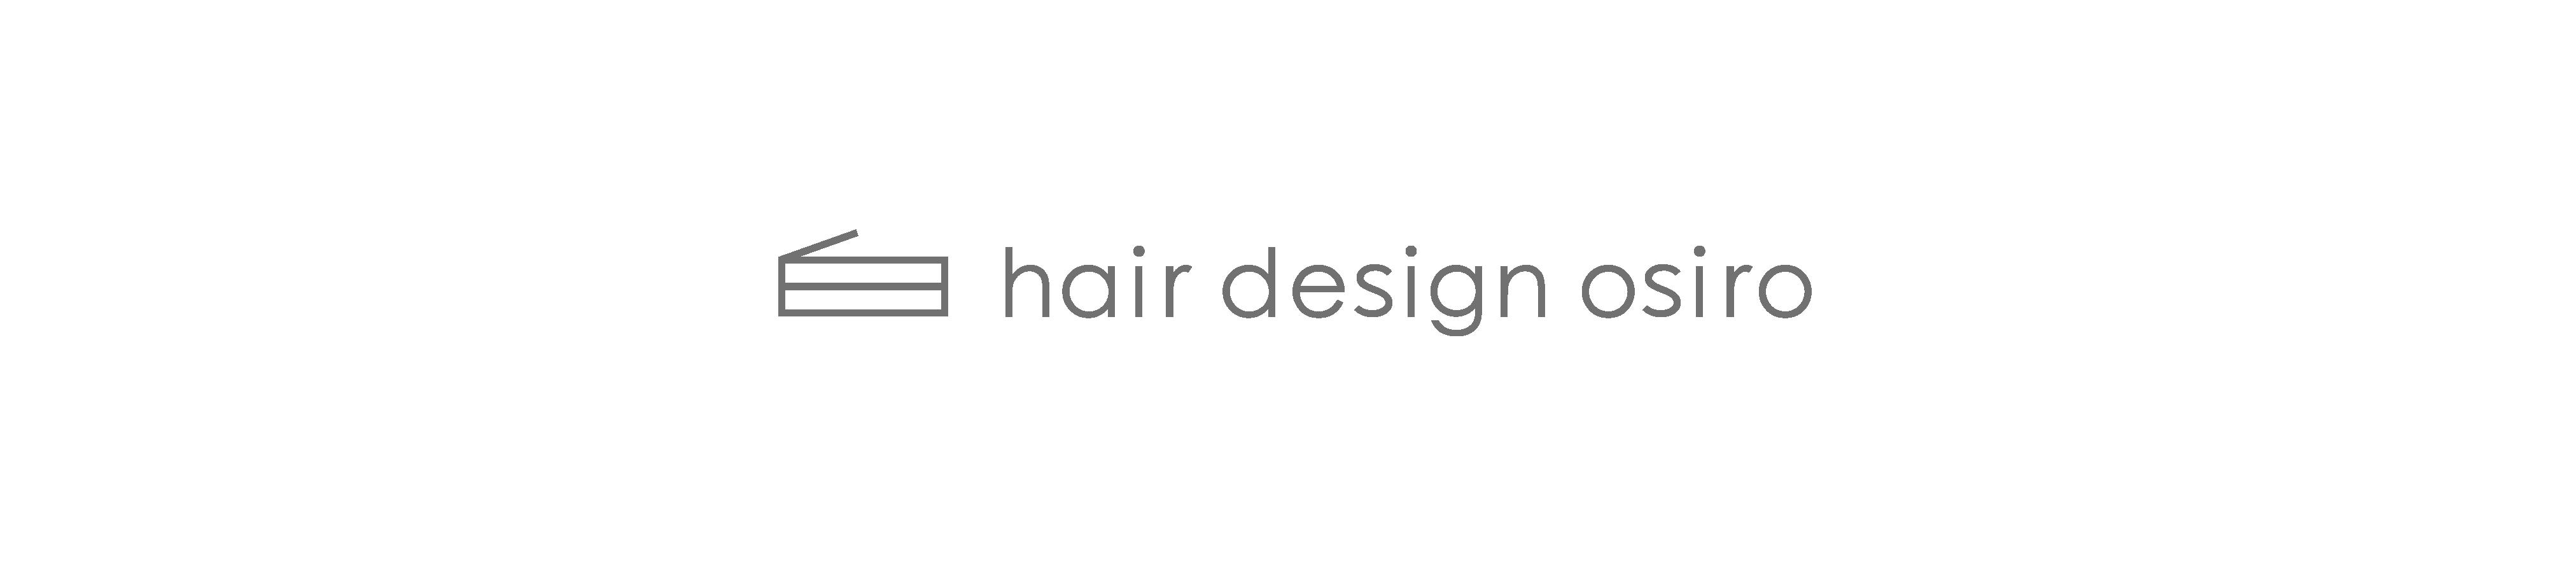 hair design osiro